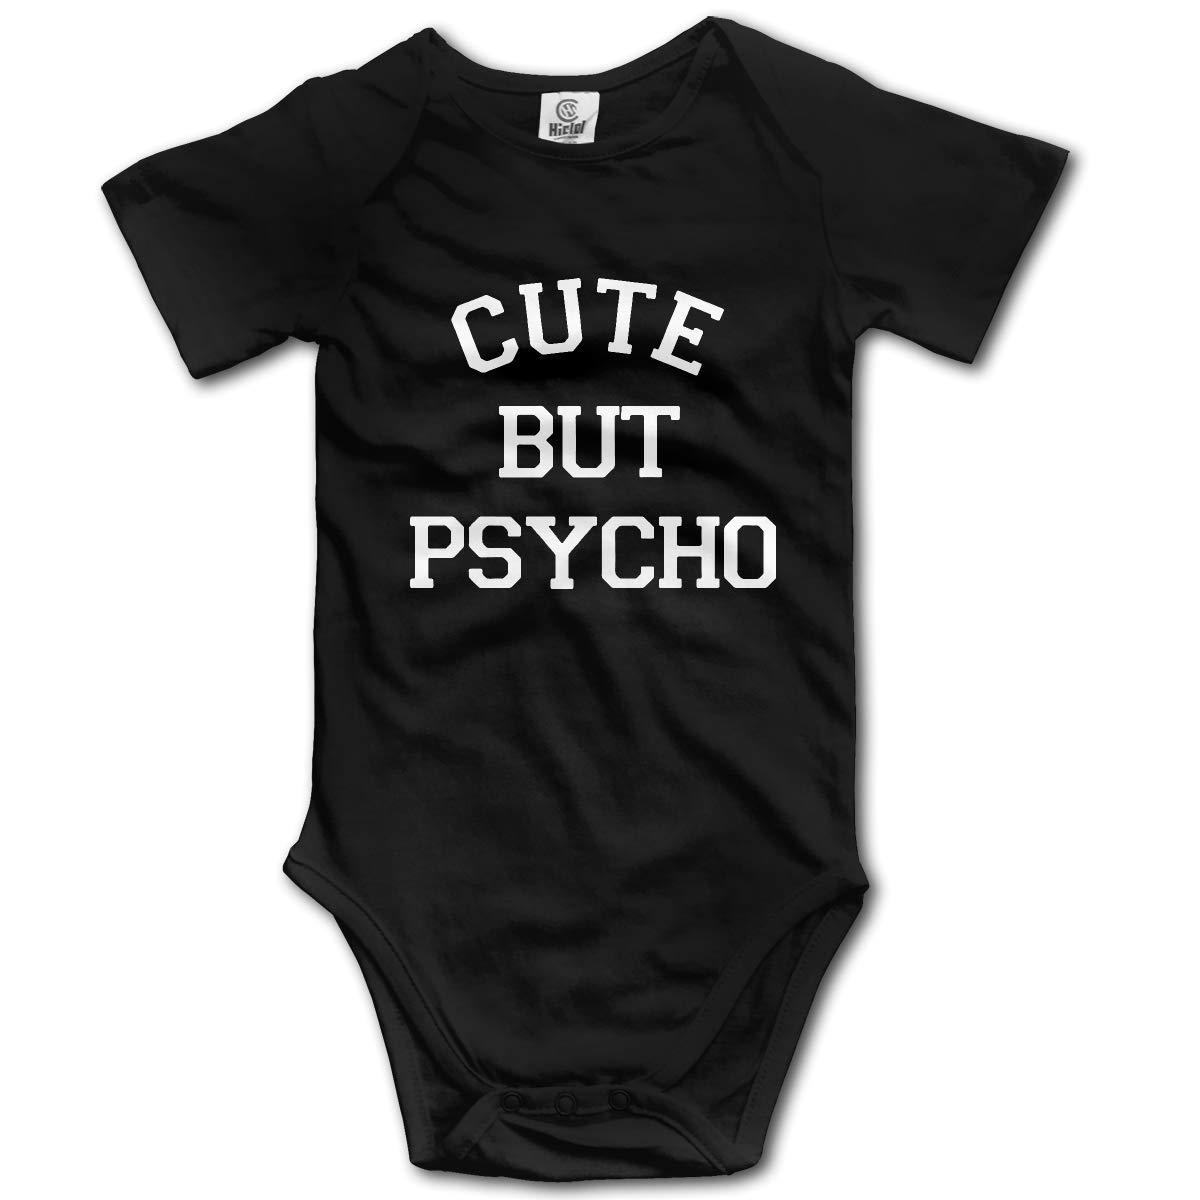 Cute But Psycho Printed Infant Baby Boy Girl Short-Sleeved Bodysuit Romper Jumpsuit